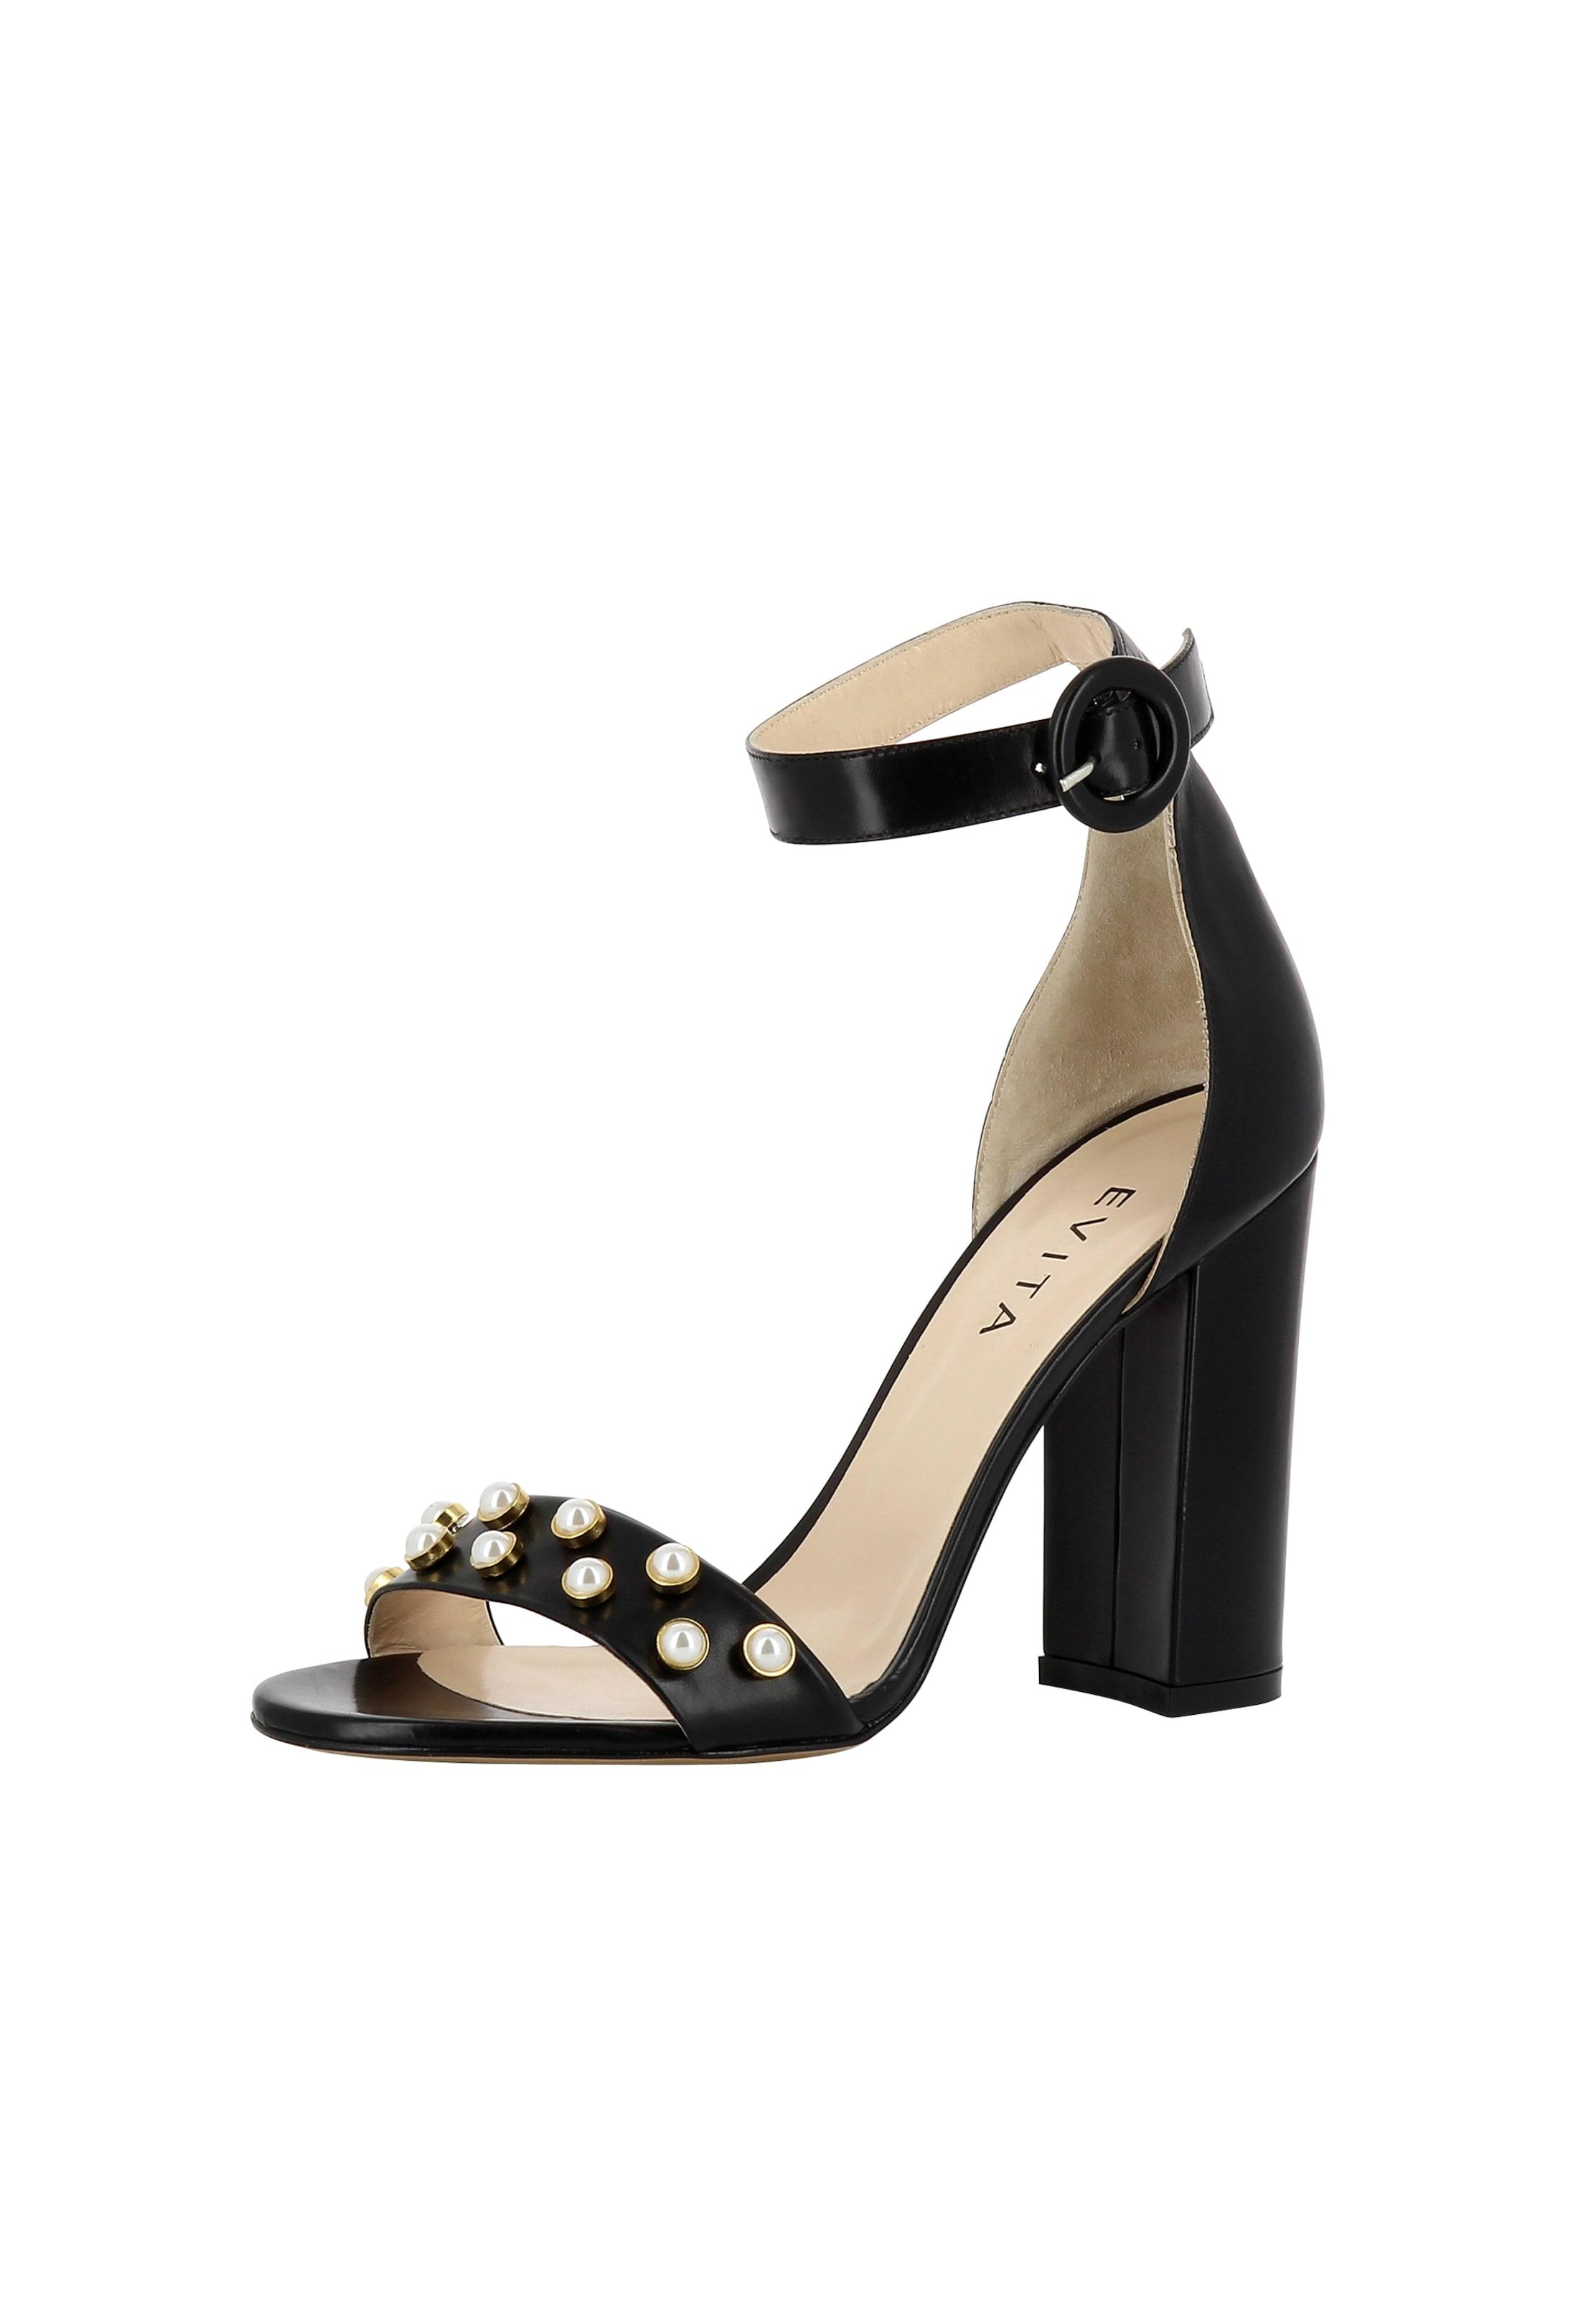 EVITA Sandalette EVA Verschleißfeste billige Schuhe